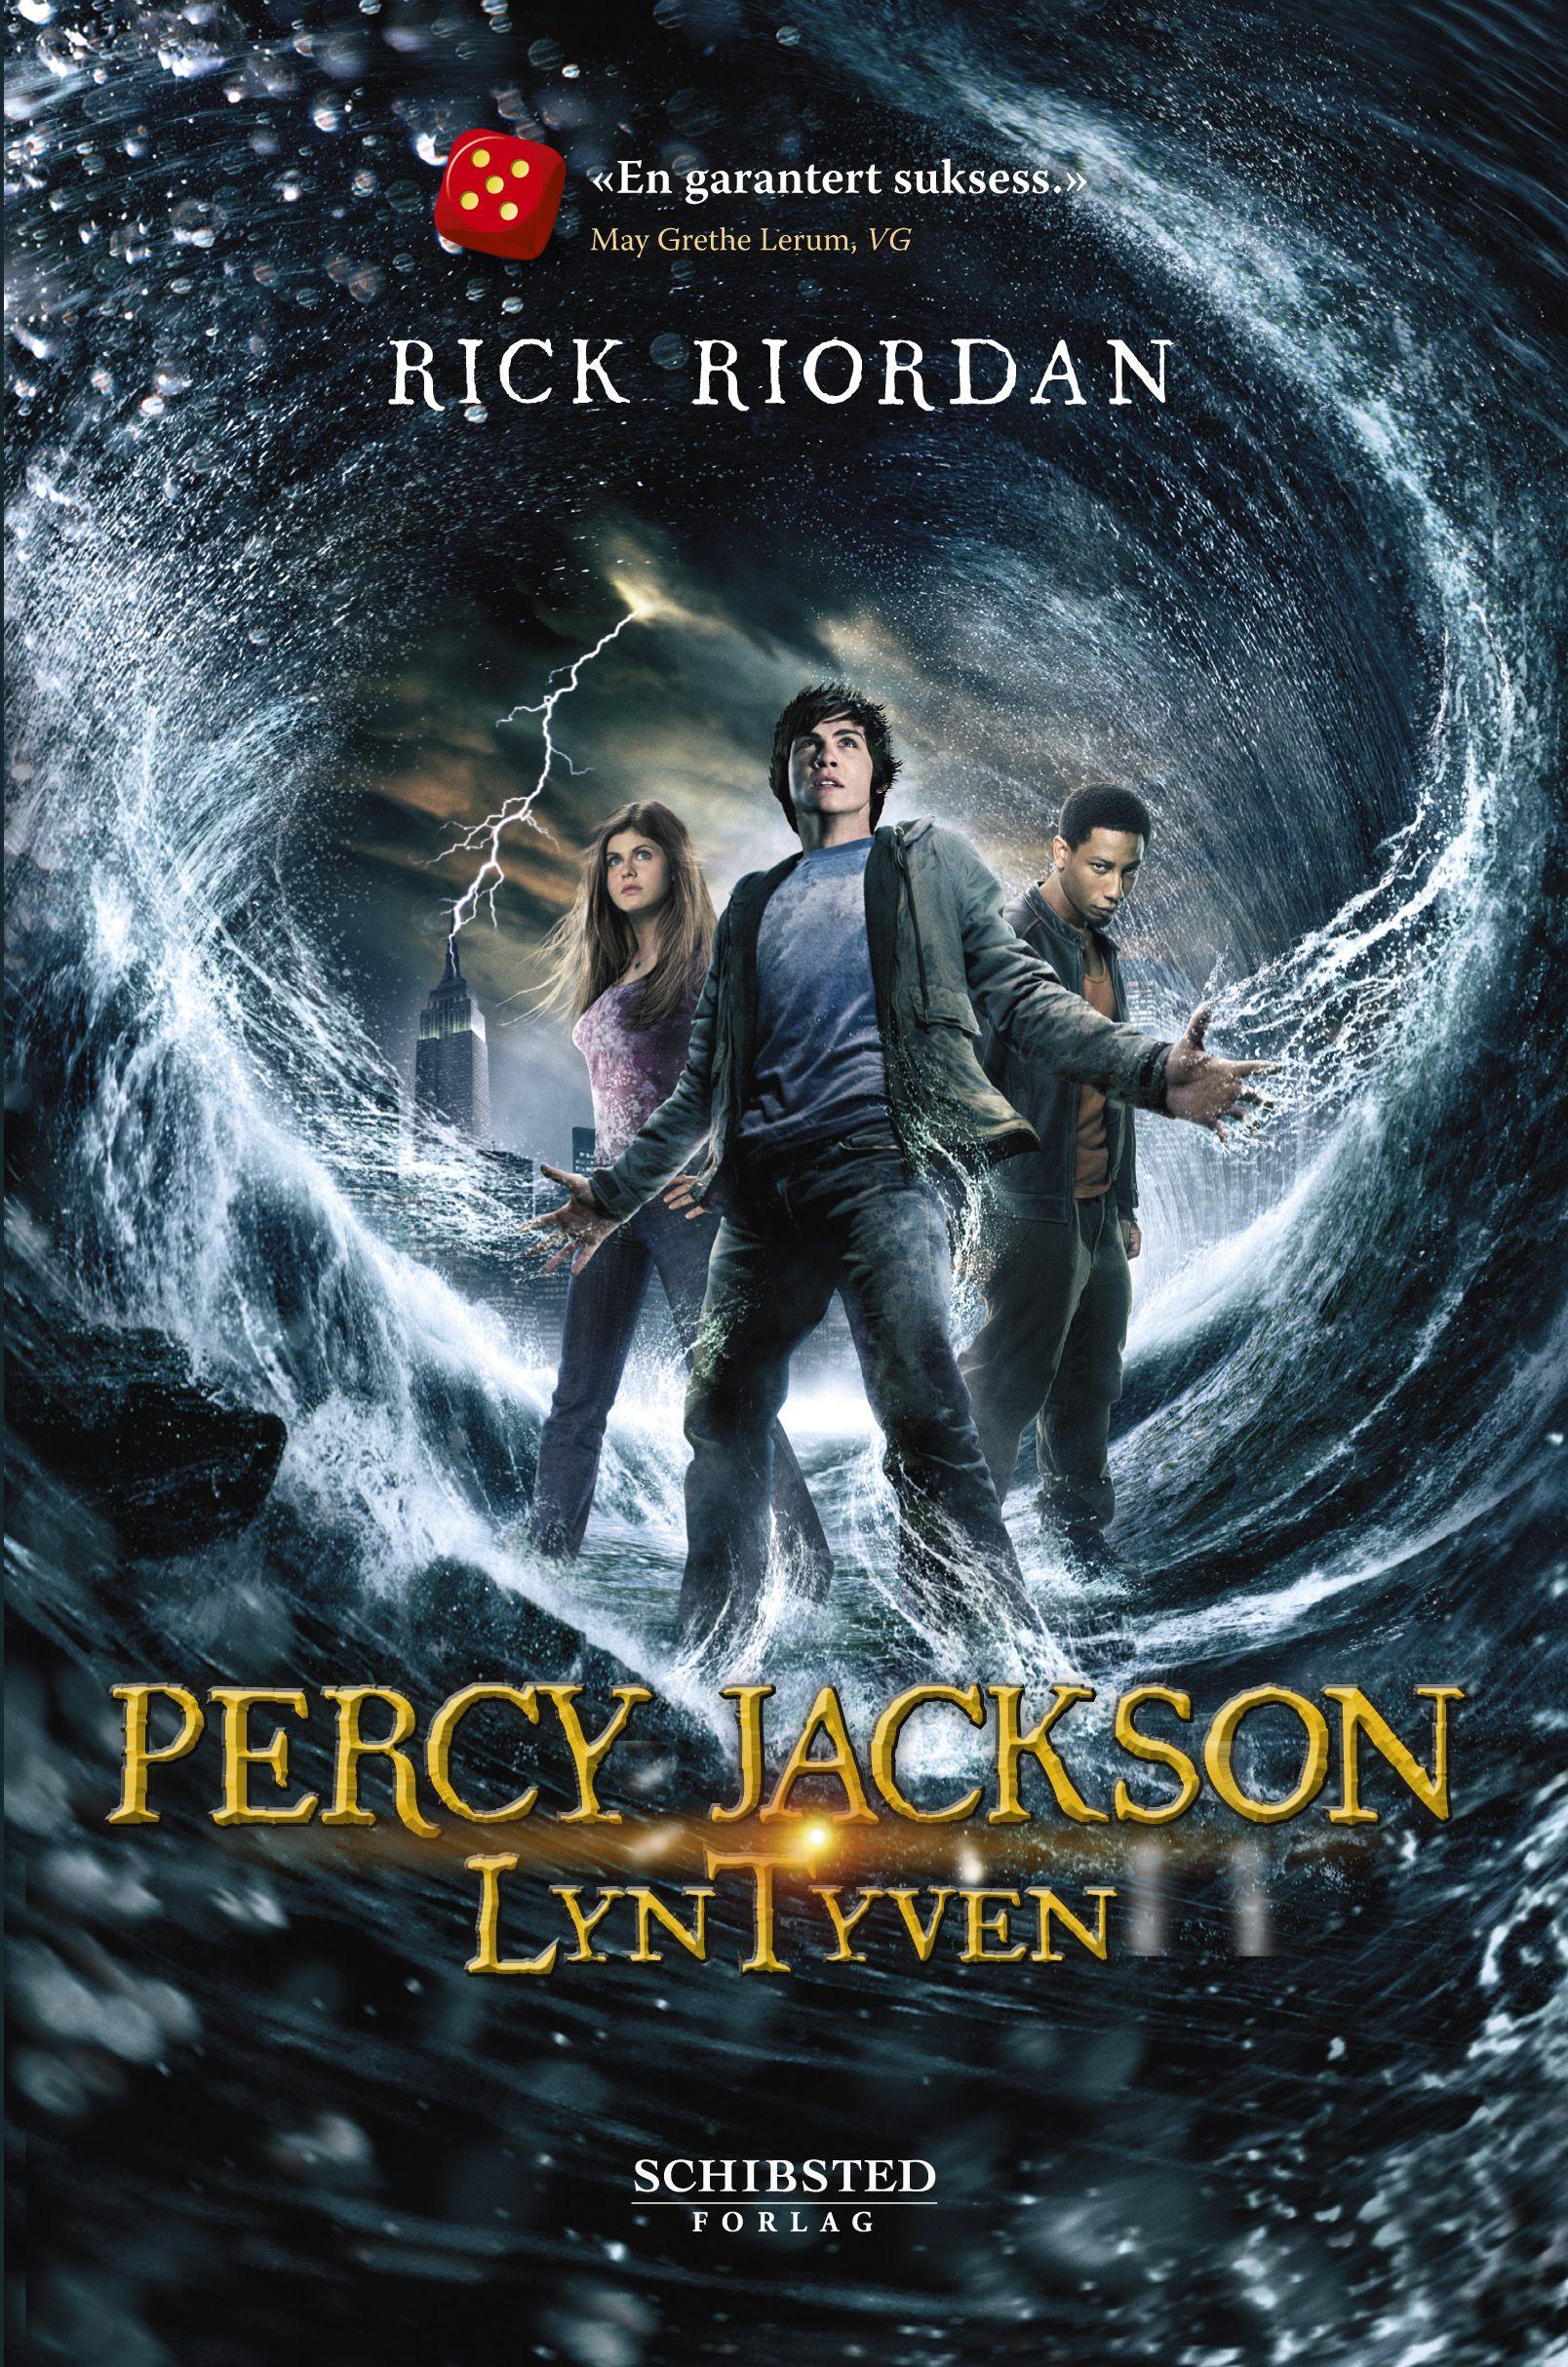 Percy Jackson 3 Film : percy, jackson, Percy, Jackson